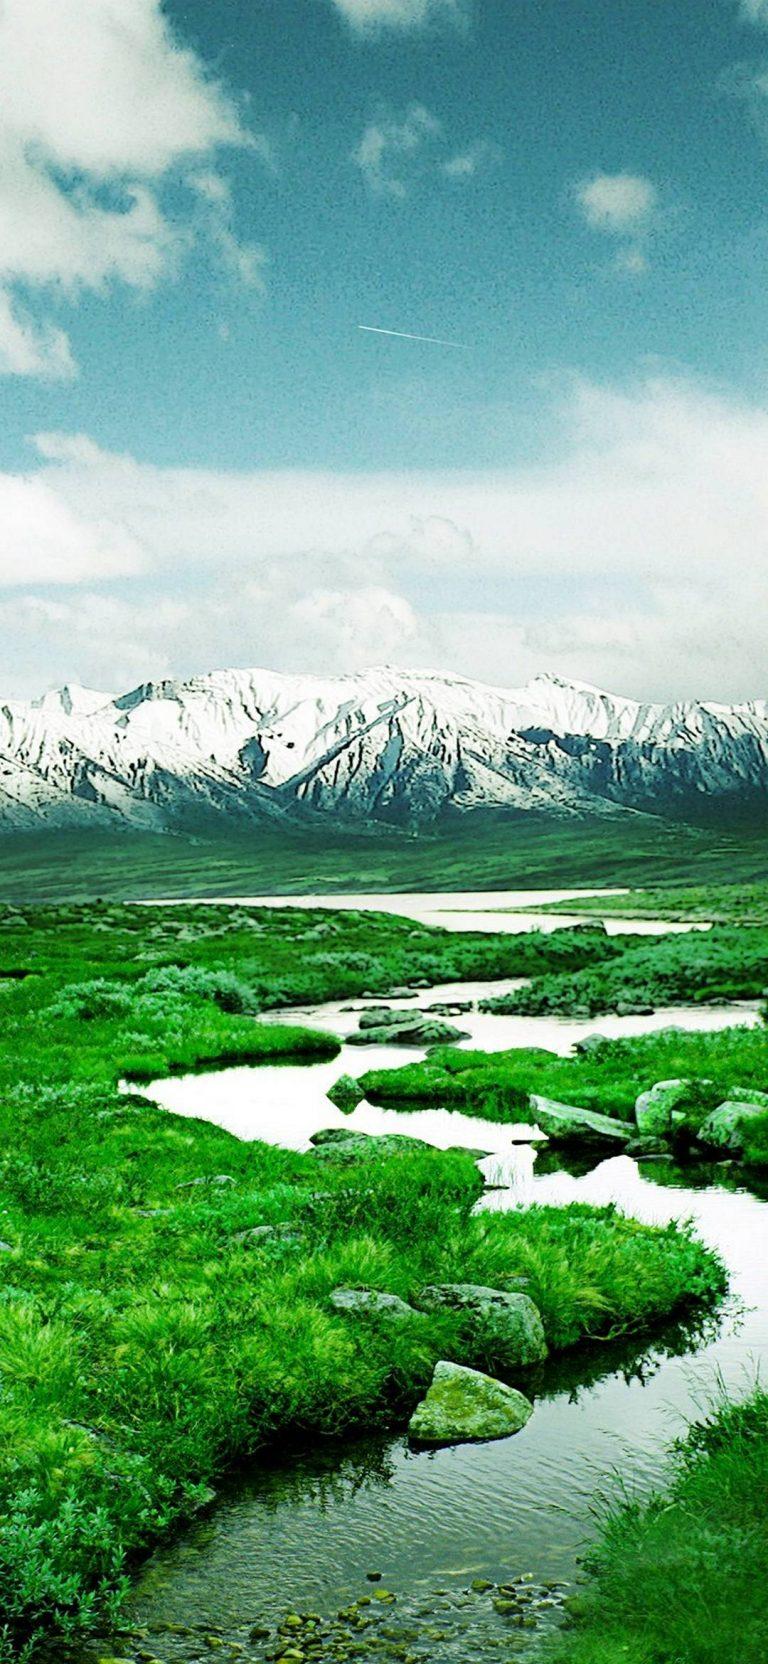 Norway Mountain River 1080x2340 768x1664